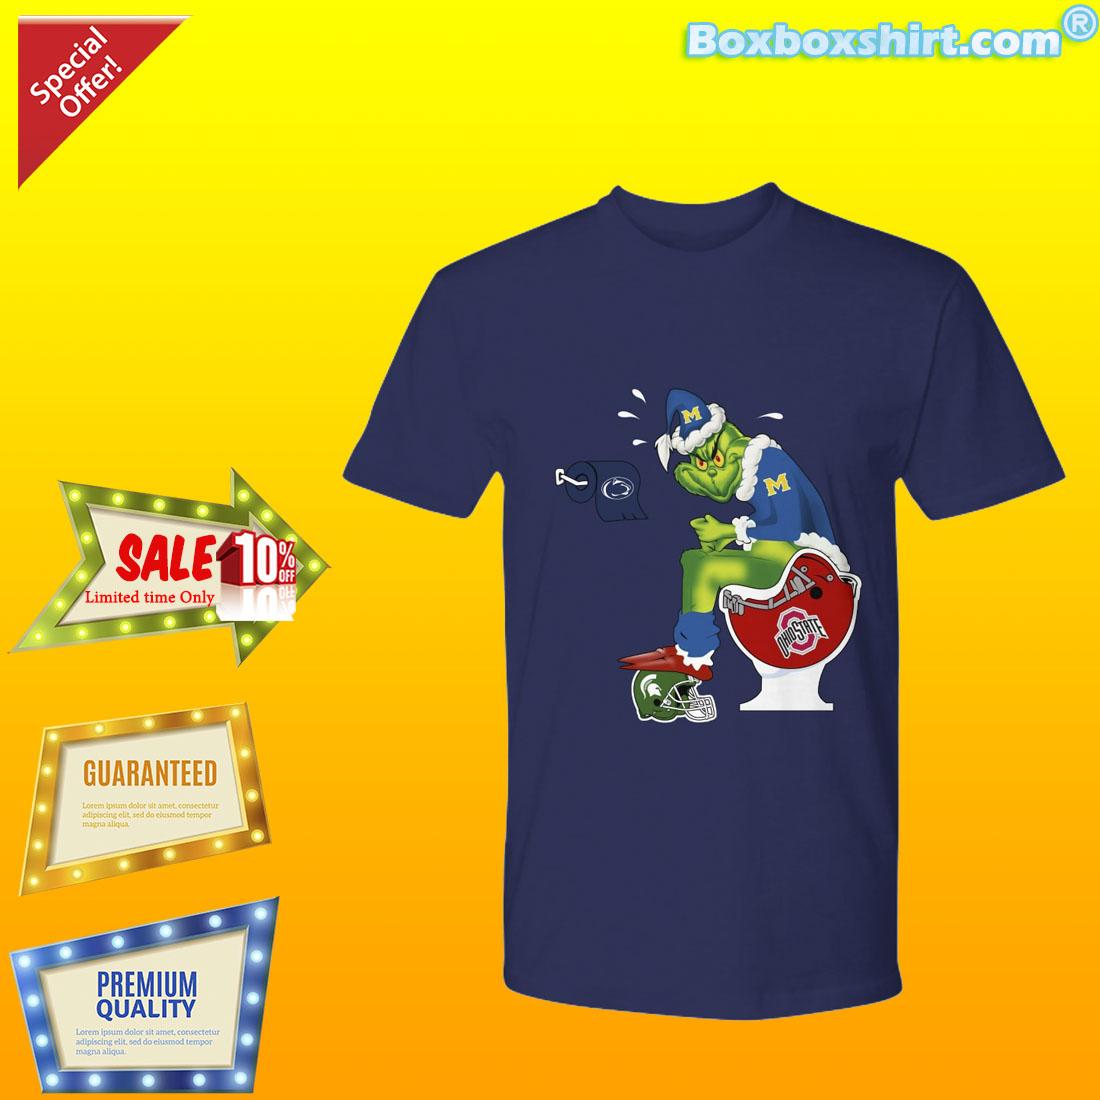 ab44f2cd7 Grinch santa on toilet NFL team logo shirt